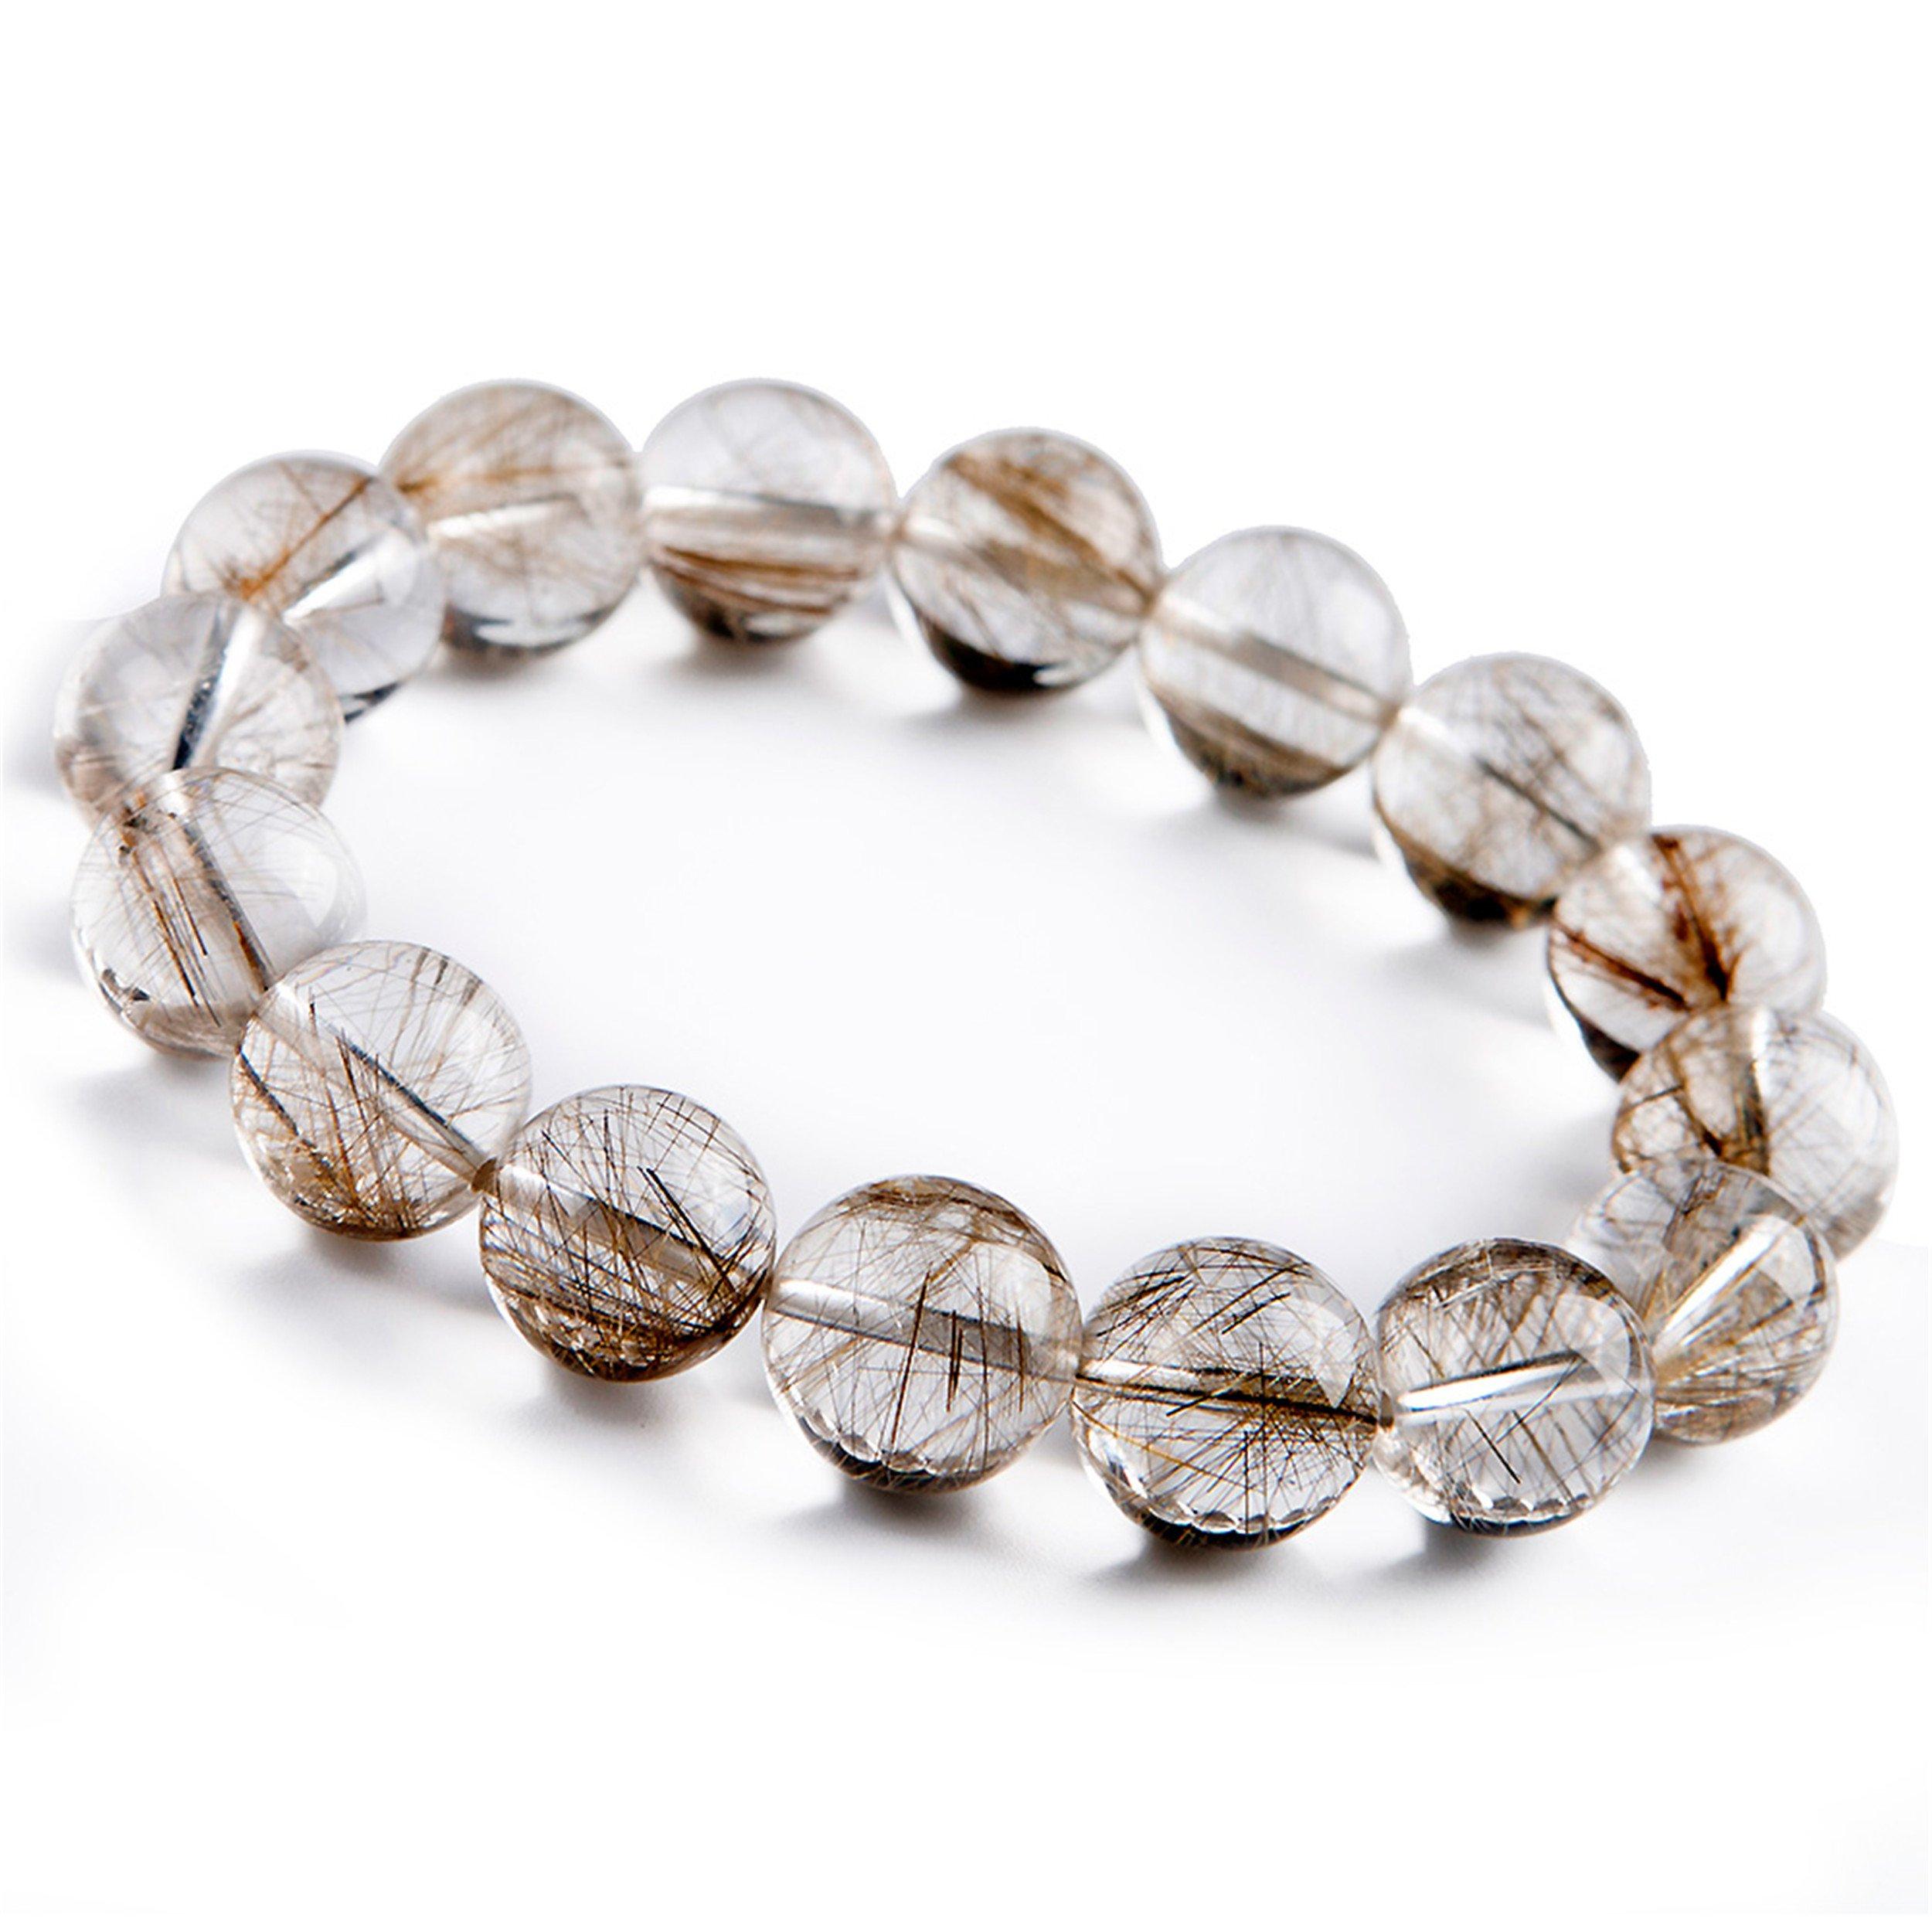 Genuine Natural Silver Rutilated Quartz Crystal Round Bead Stretch Bracelet 13mm